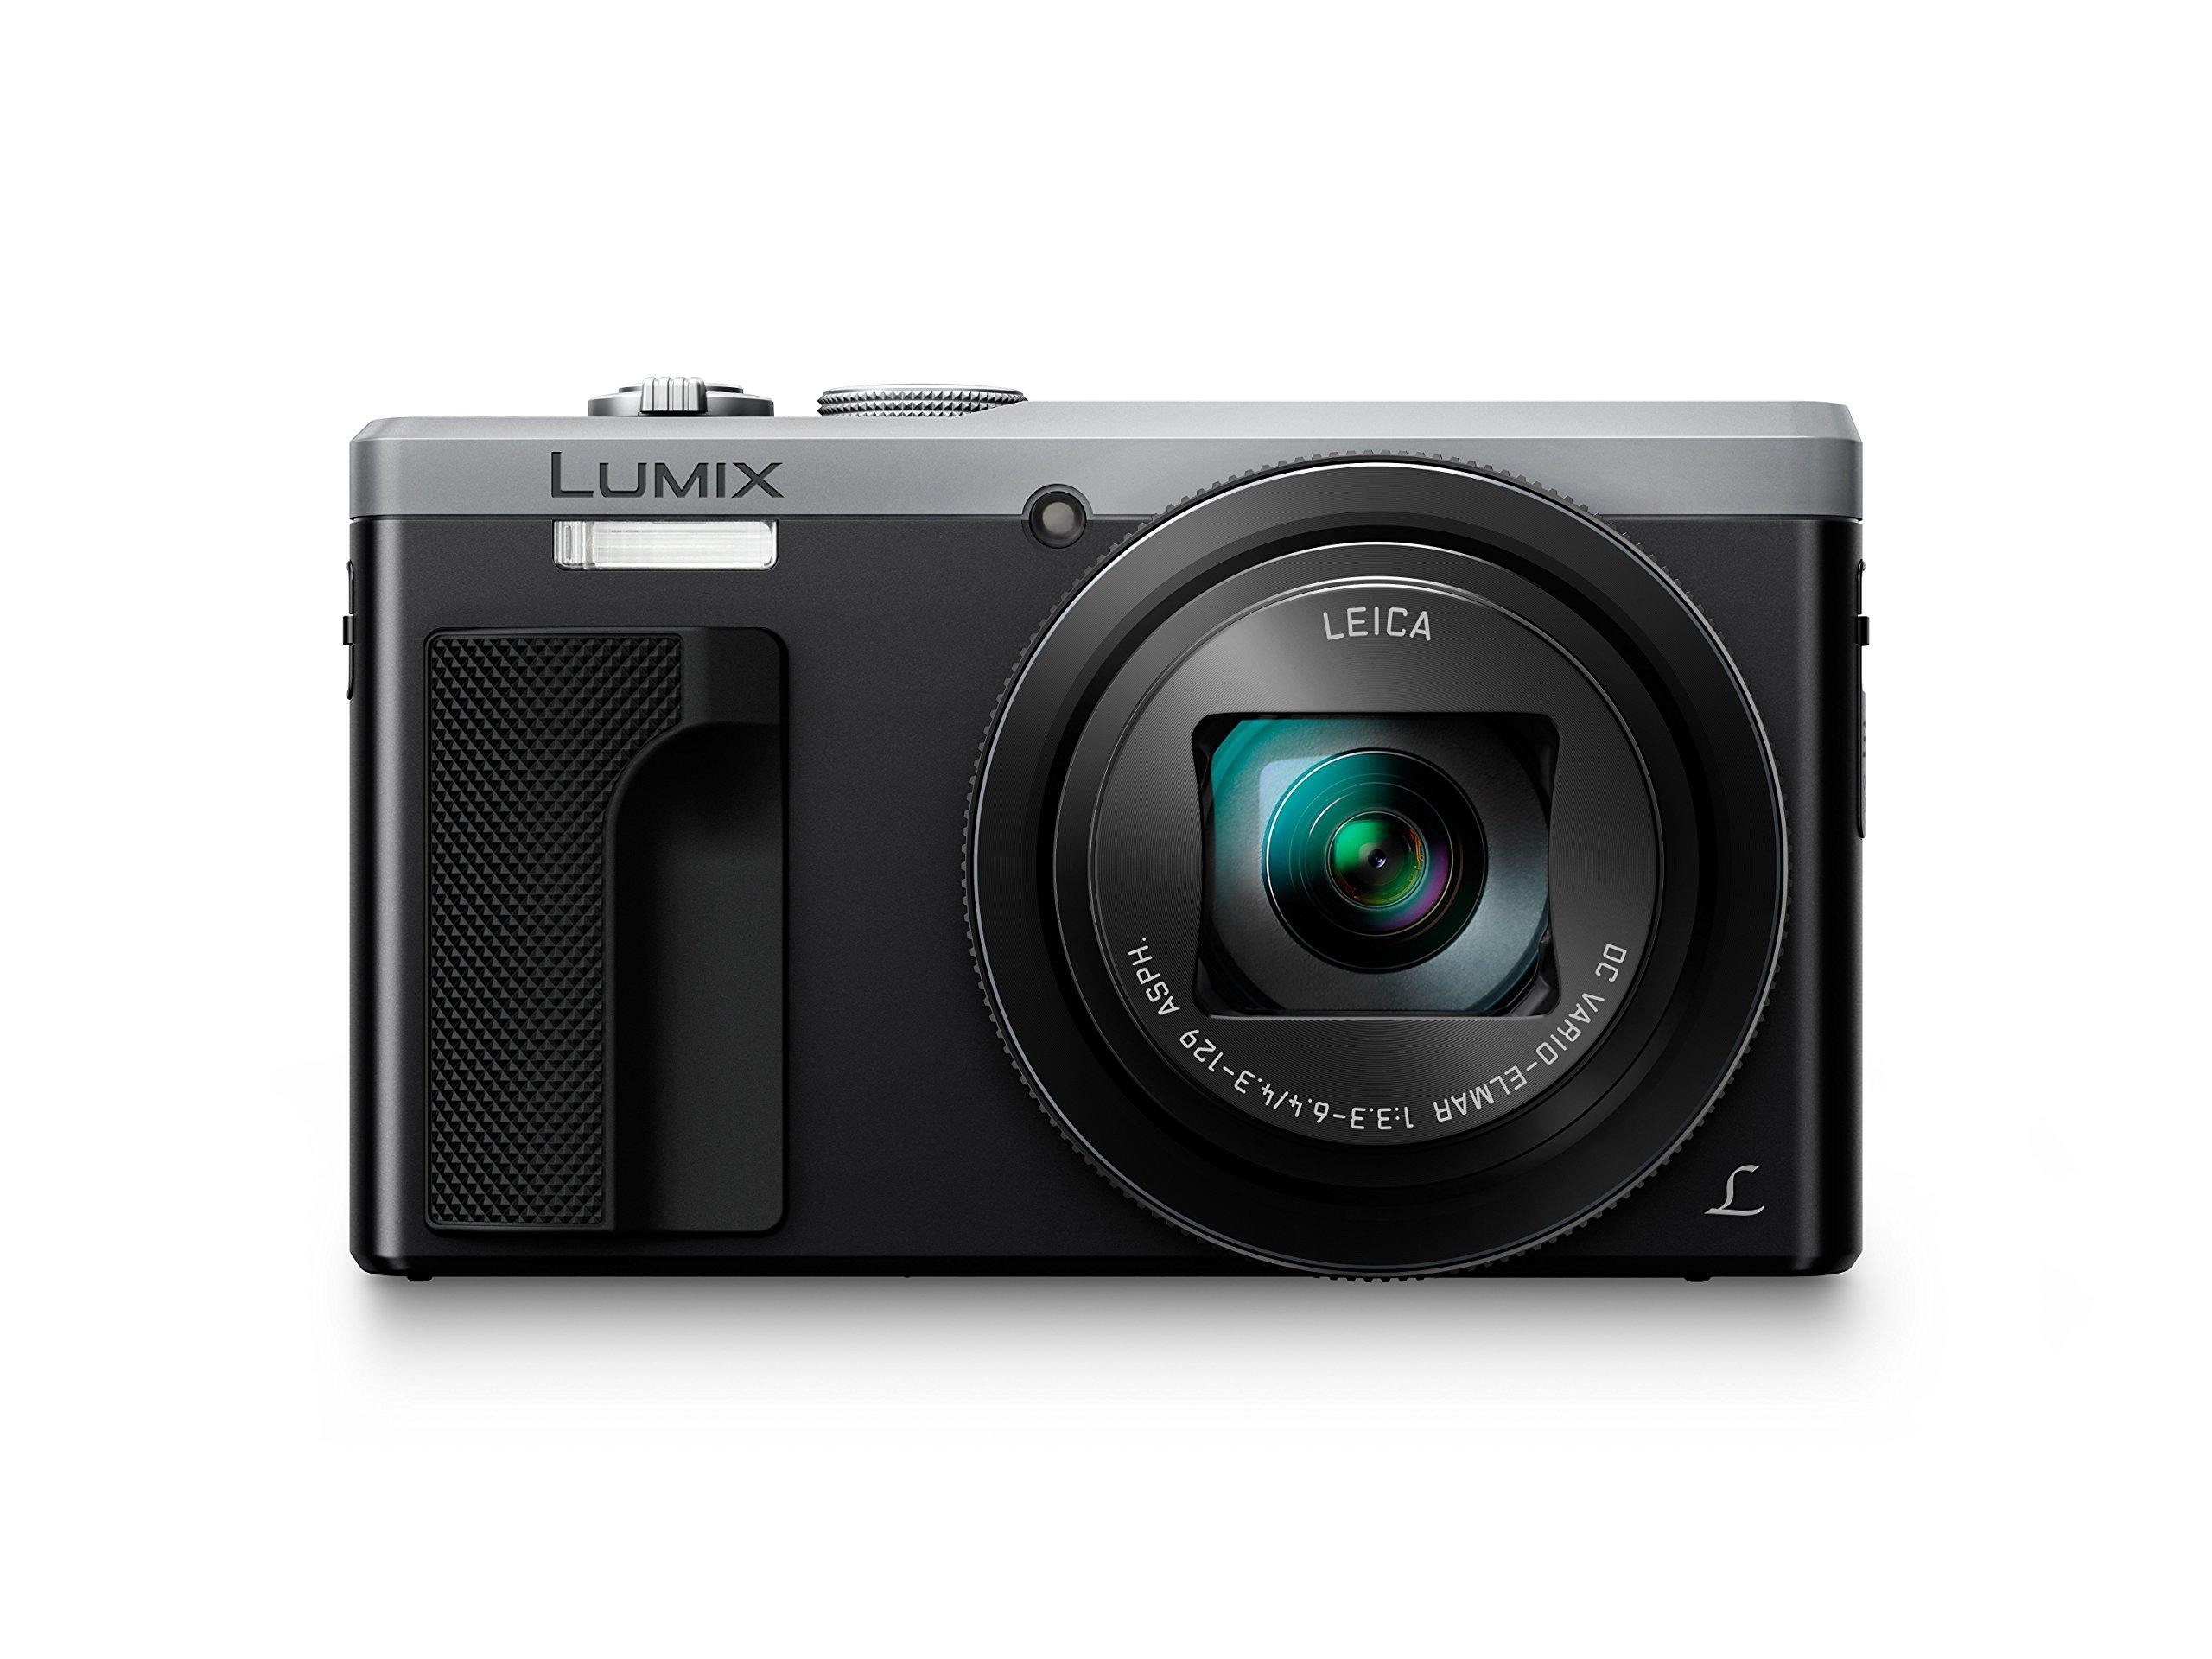 PANASONIC LUMIX 4K Point and Shoot Camera, 30X LEICA DC Vario-ELMAR Lens F3.3-6.4, 18 Megapixels, High Sensitivity Sensor, DMC-ZS60S (SILVER) by Panasonic (Image #1)